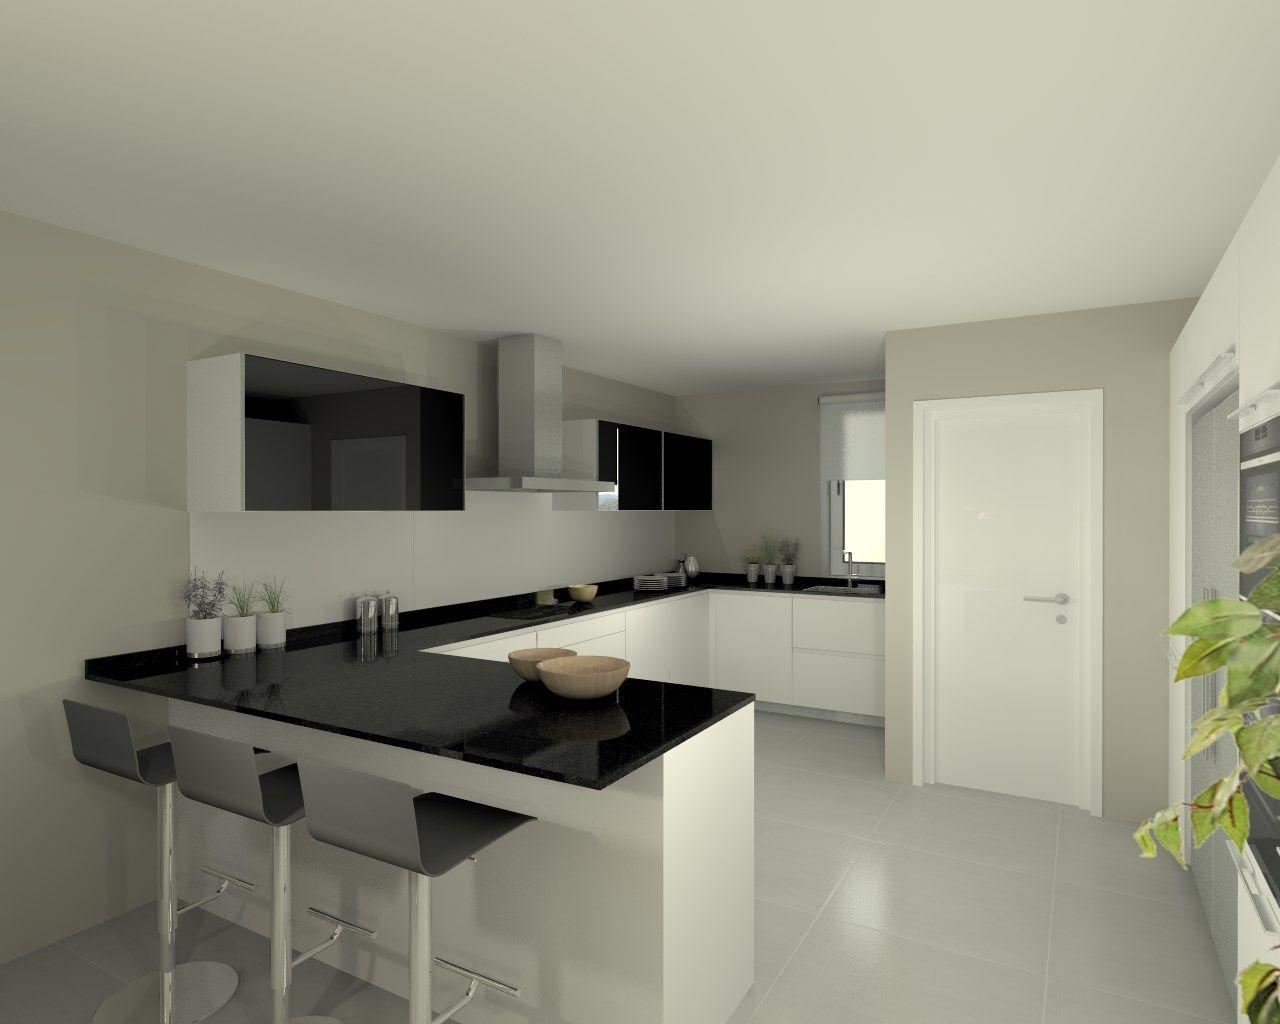 Modelo line e blanco encimera granito negro cocinas - Cocina blanca encimera negra ...